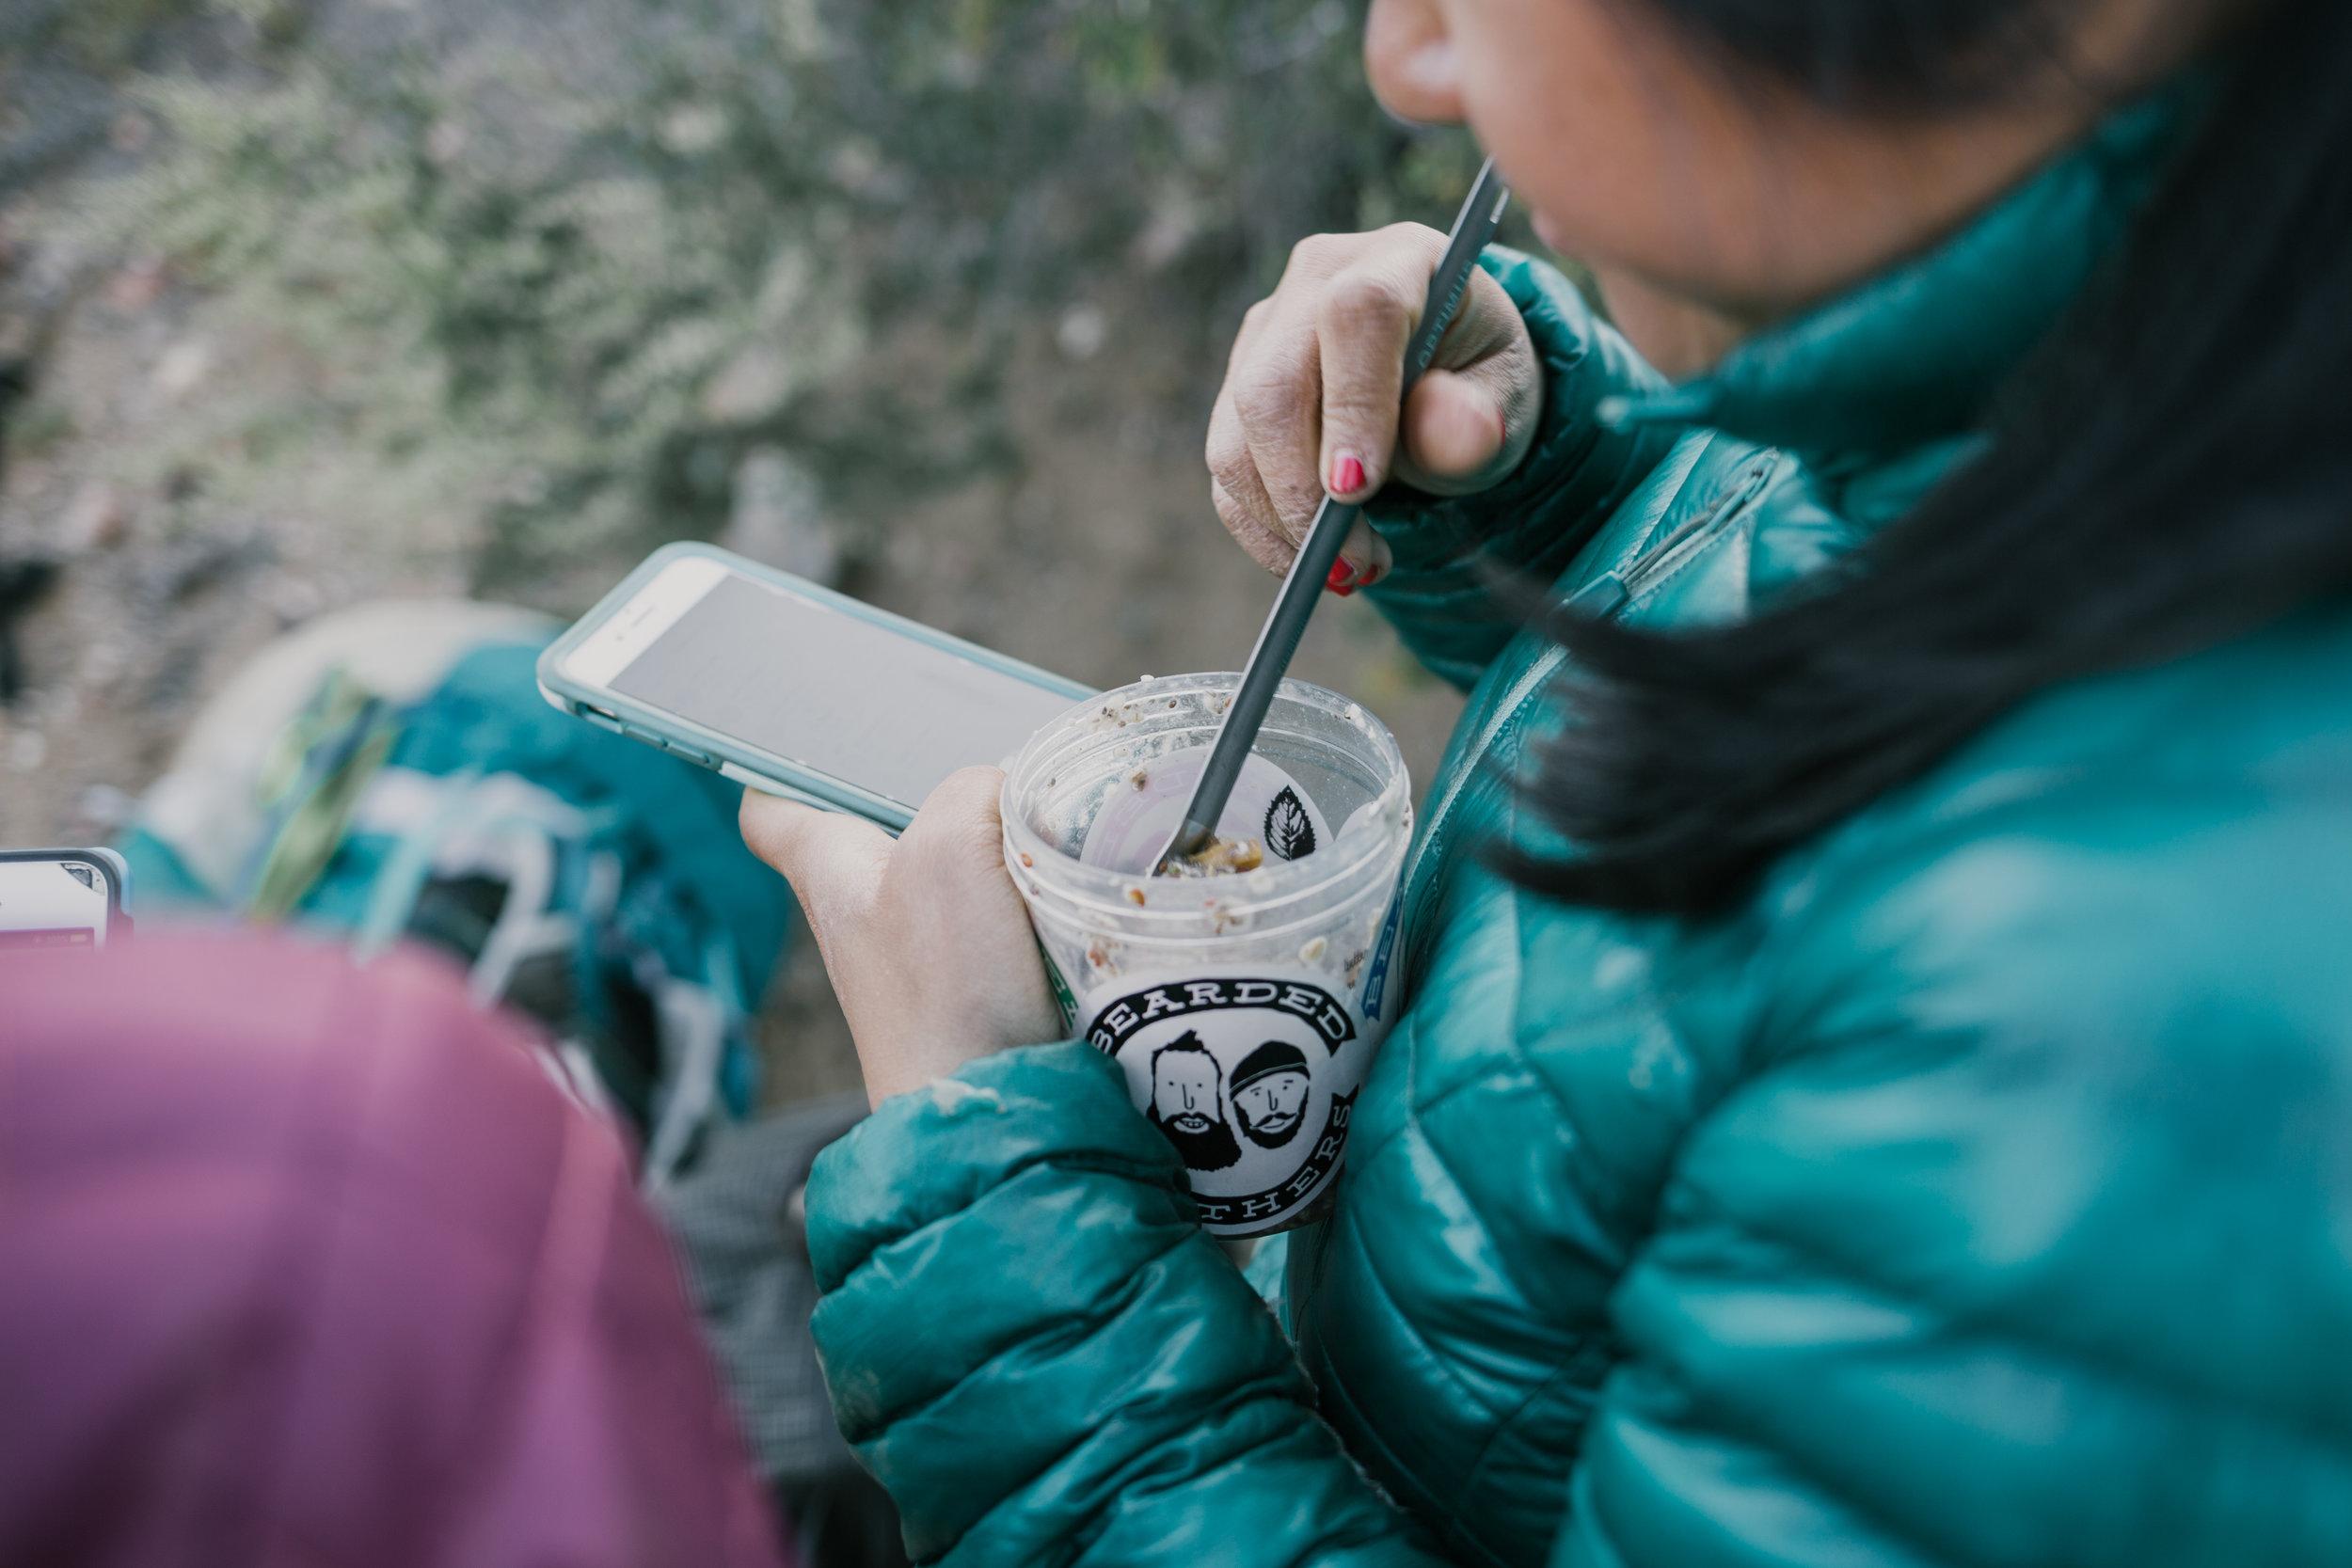 Multitasking: eating and blogging, jk. Photo by: Nate/Meg